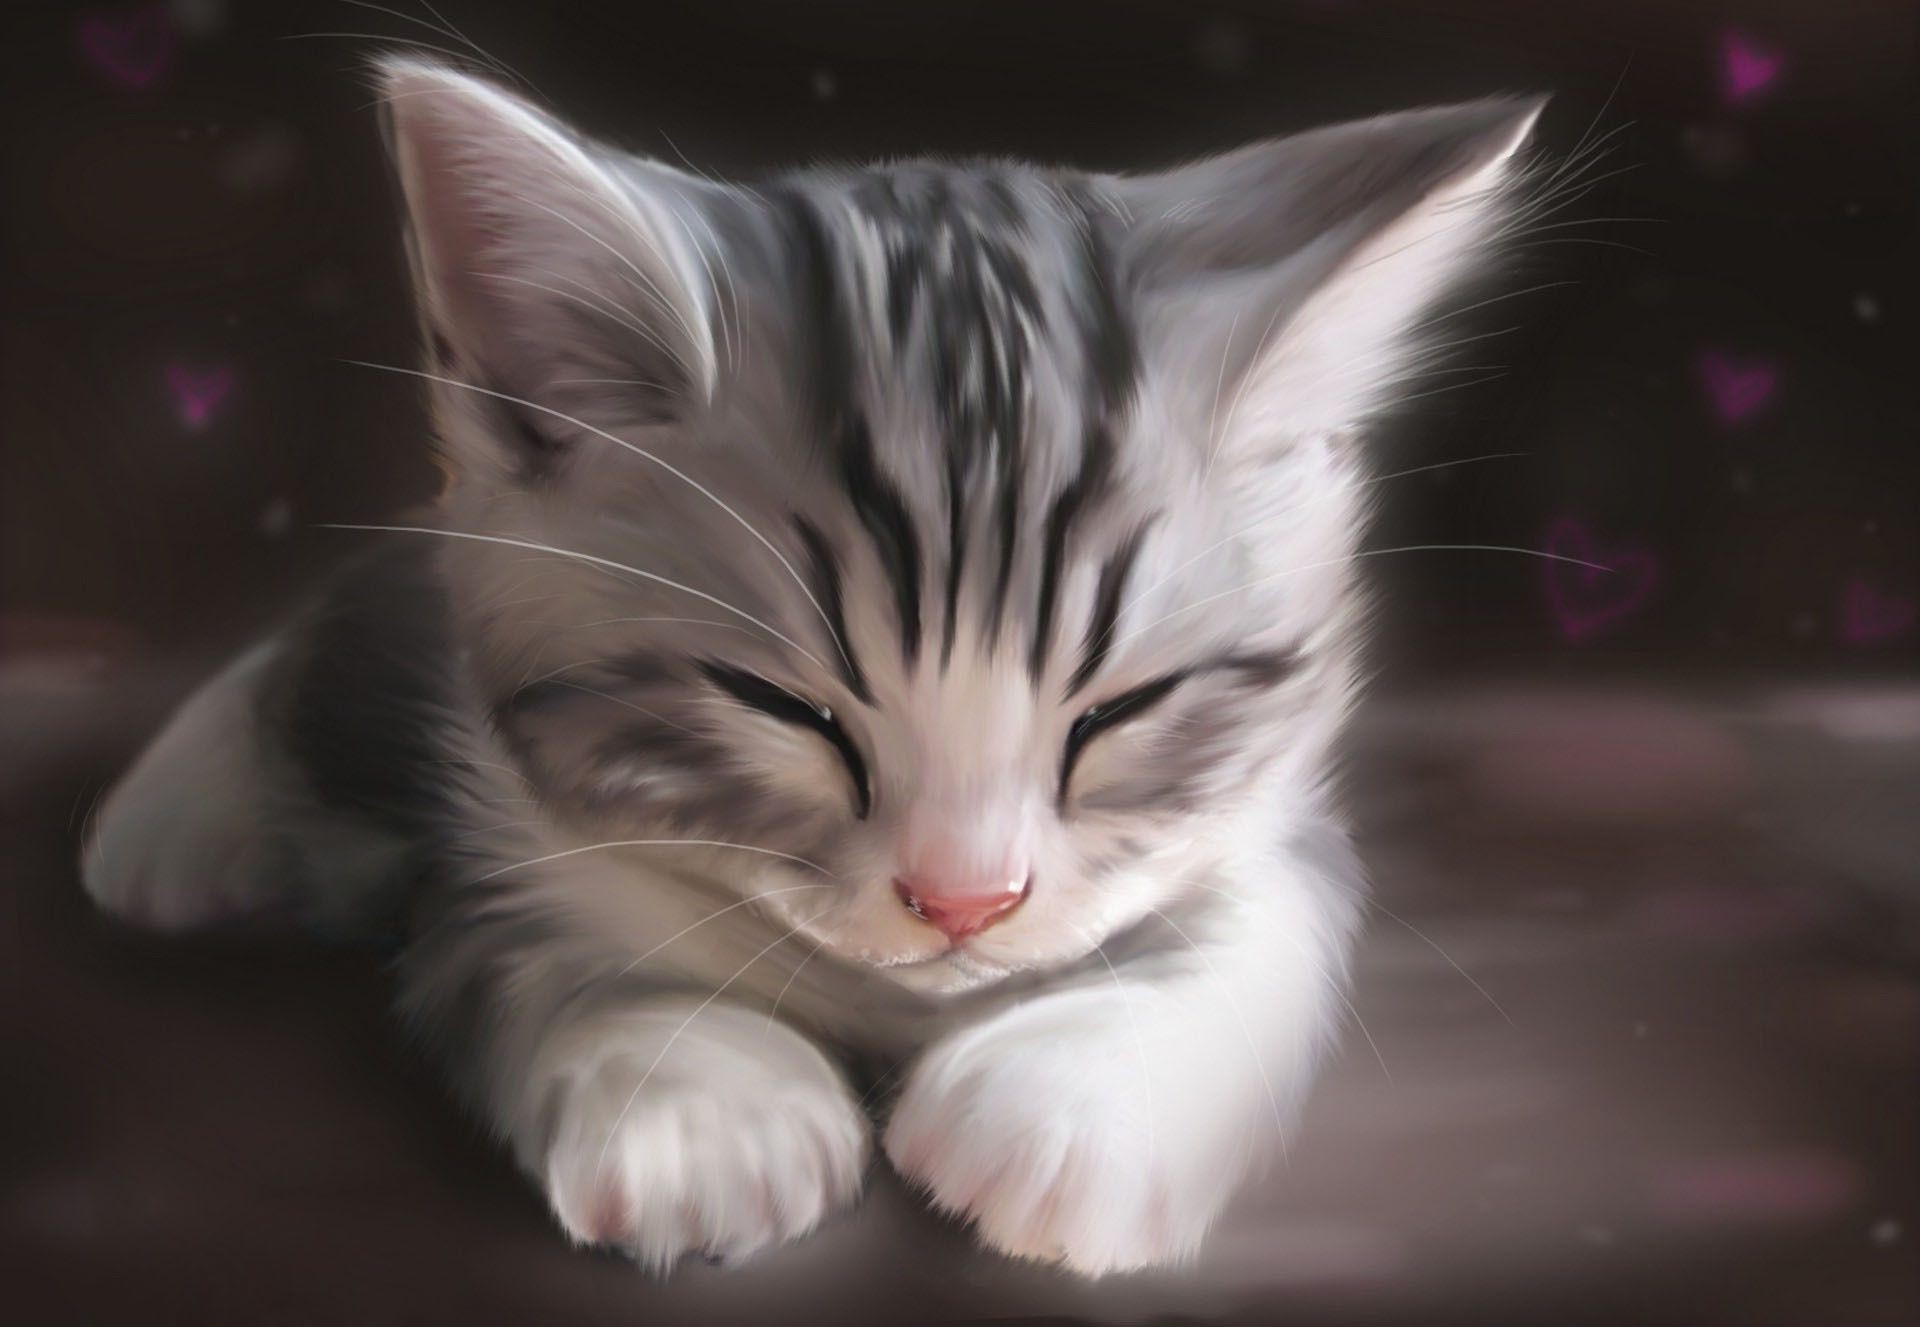 Art Kitty Cat Figure Cat Desktop Wallpapers For Free